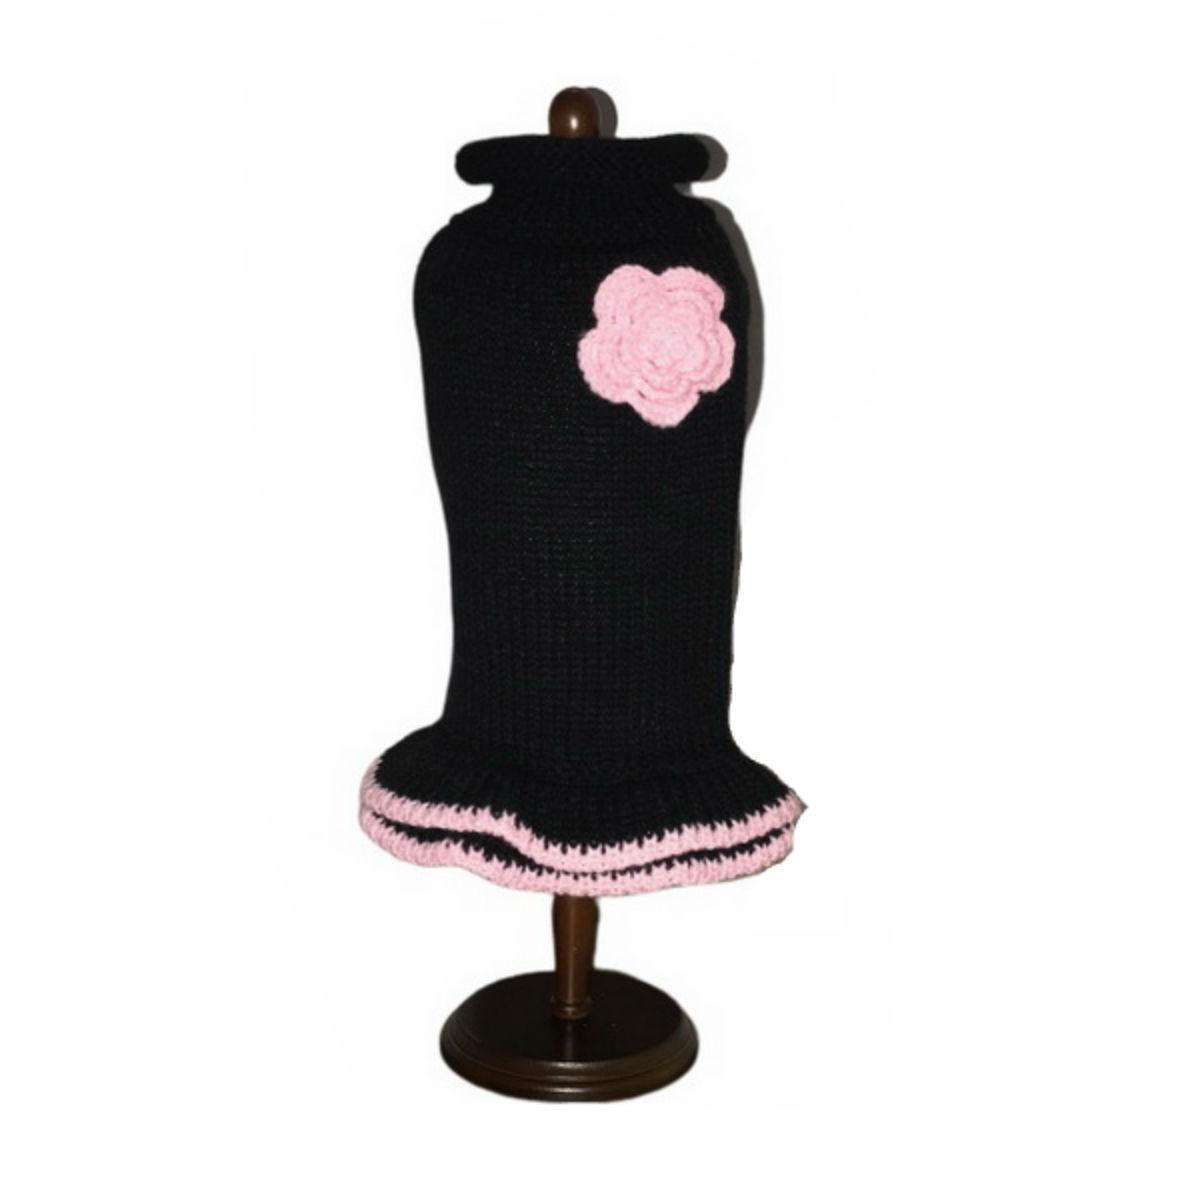 Dallas Dogs Lil Black Dog Sweater Dress